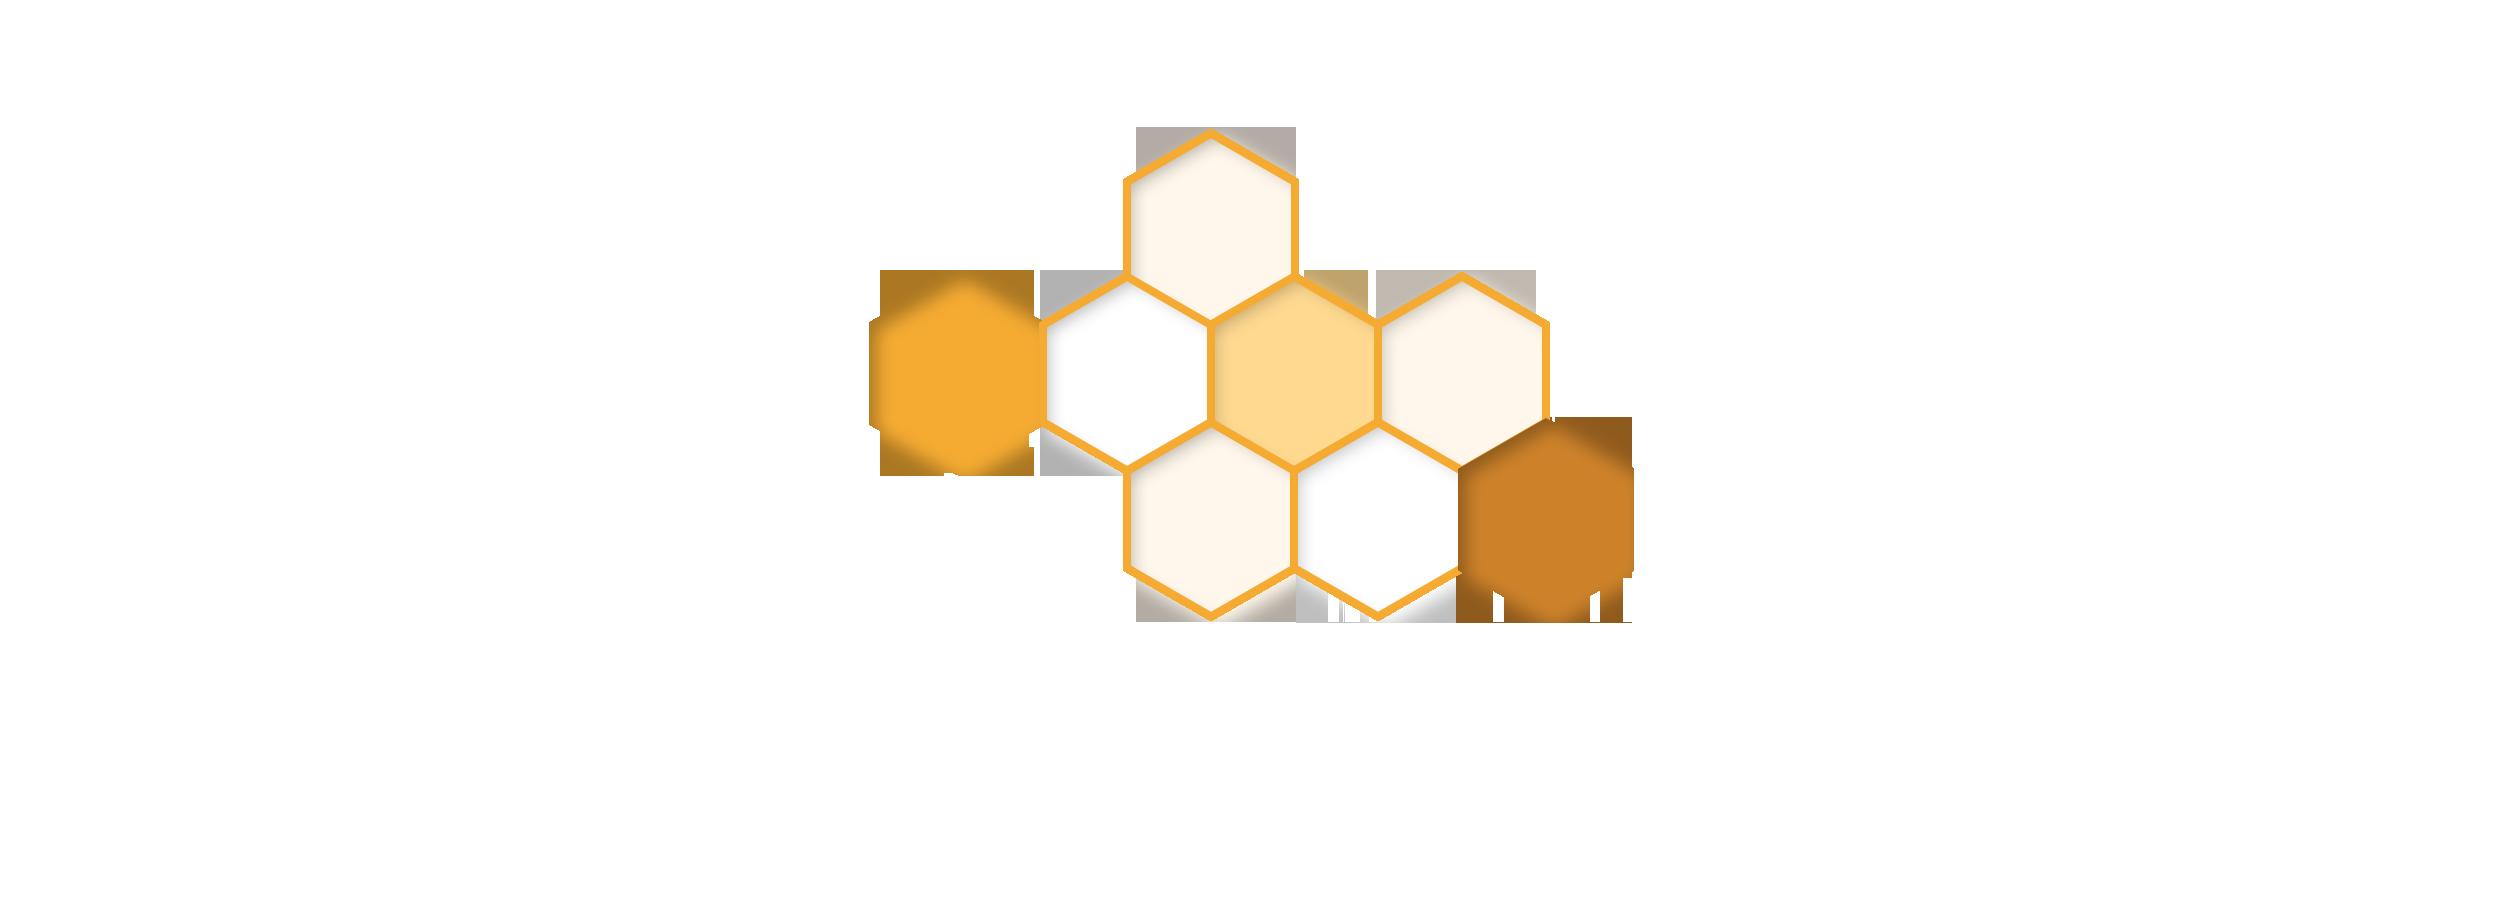 honeycomb_c2.png